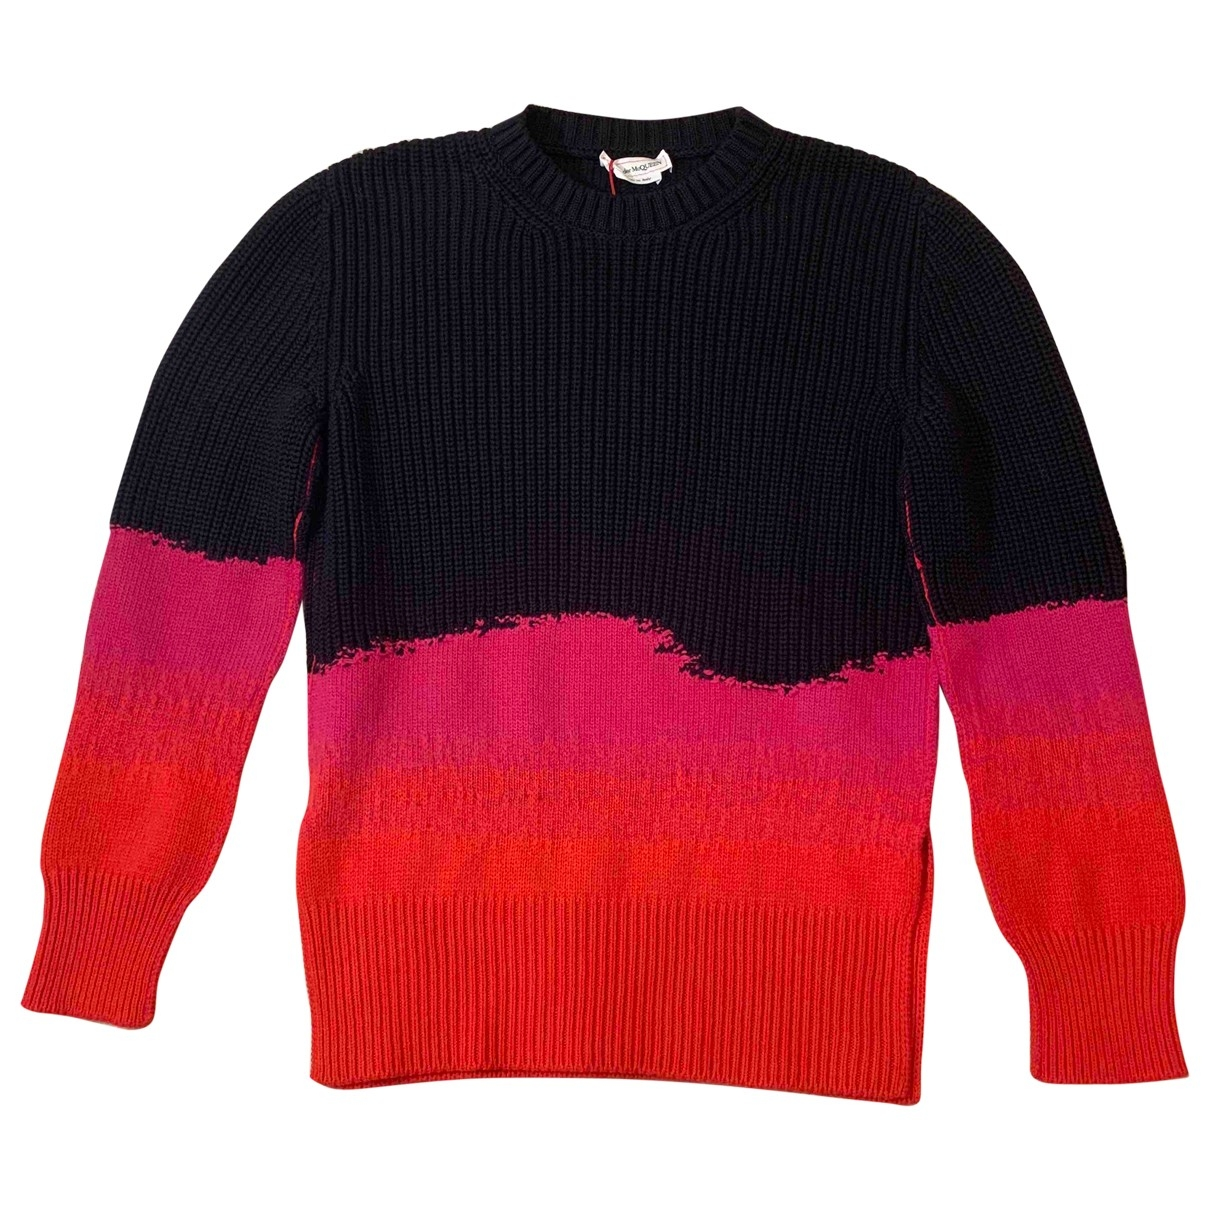 Alexander Mcqueen \N Multicolour Cotton Knitwear & Sweatshirts for Men S International